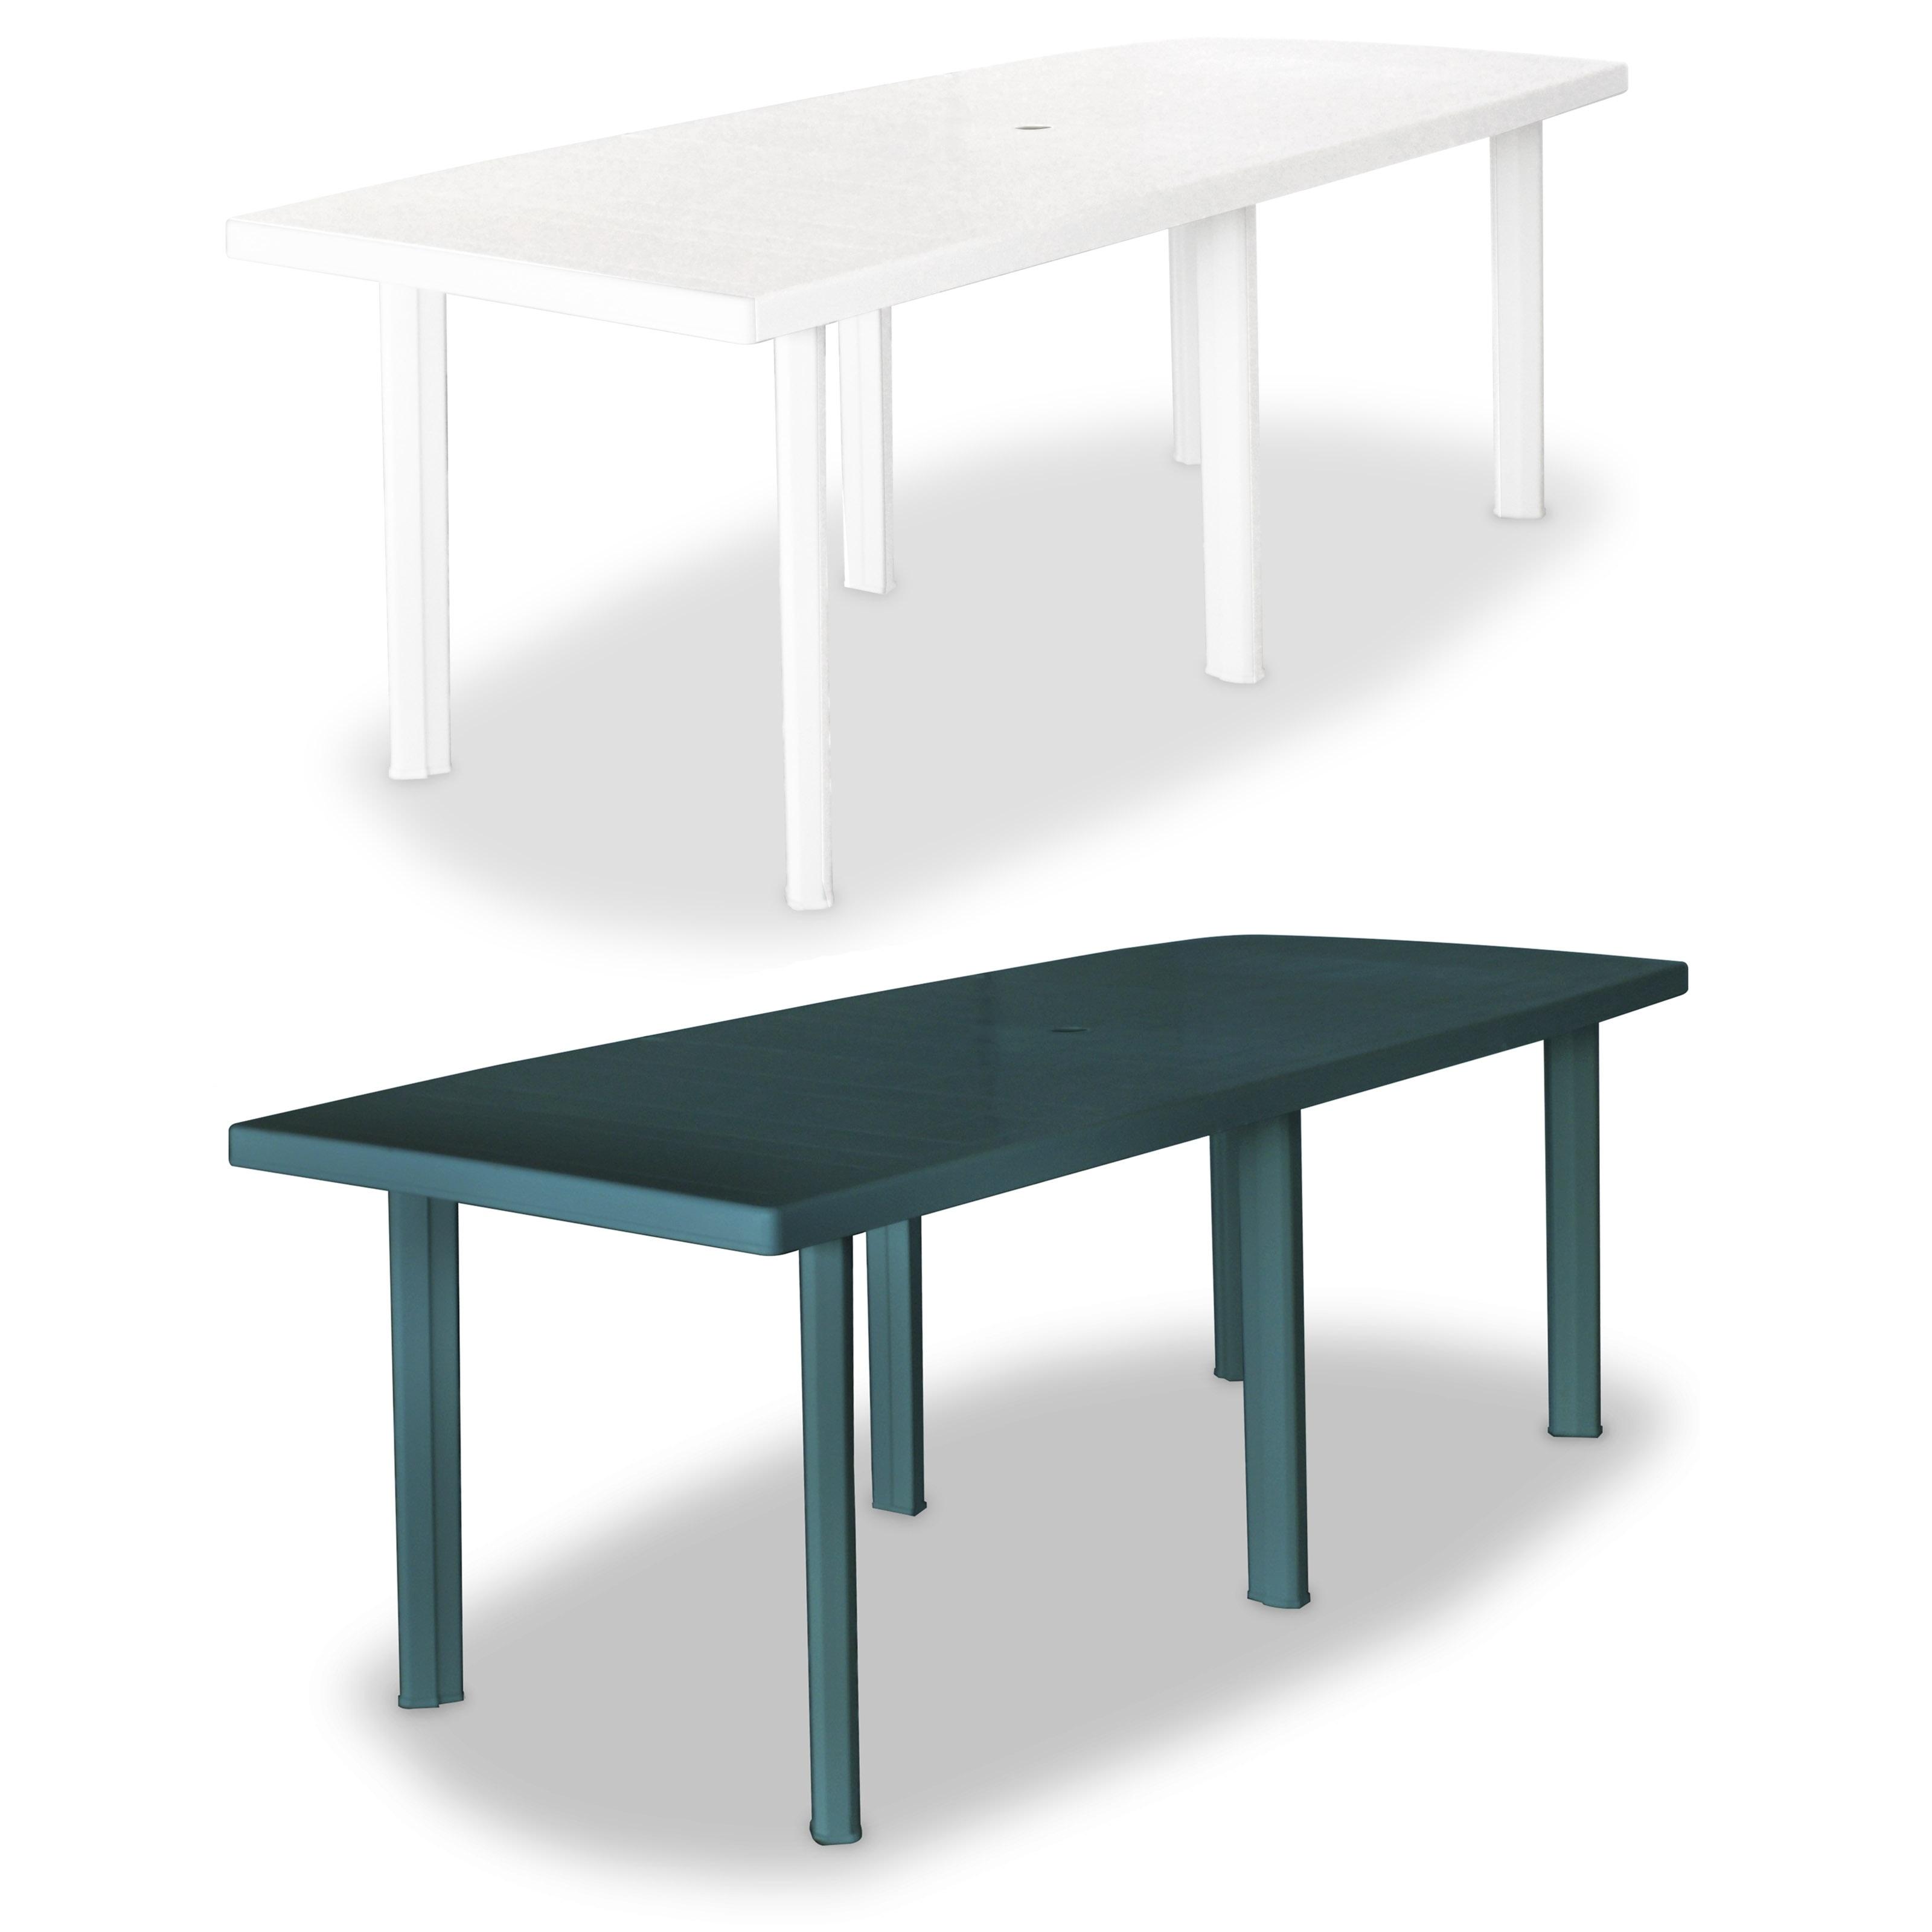 Sensational Vidaxl Garden Table 82 7 Plastic Outdoor Dining Camping Table Dailytribune Chair Design For Home Dailytribuneorg